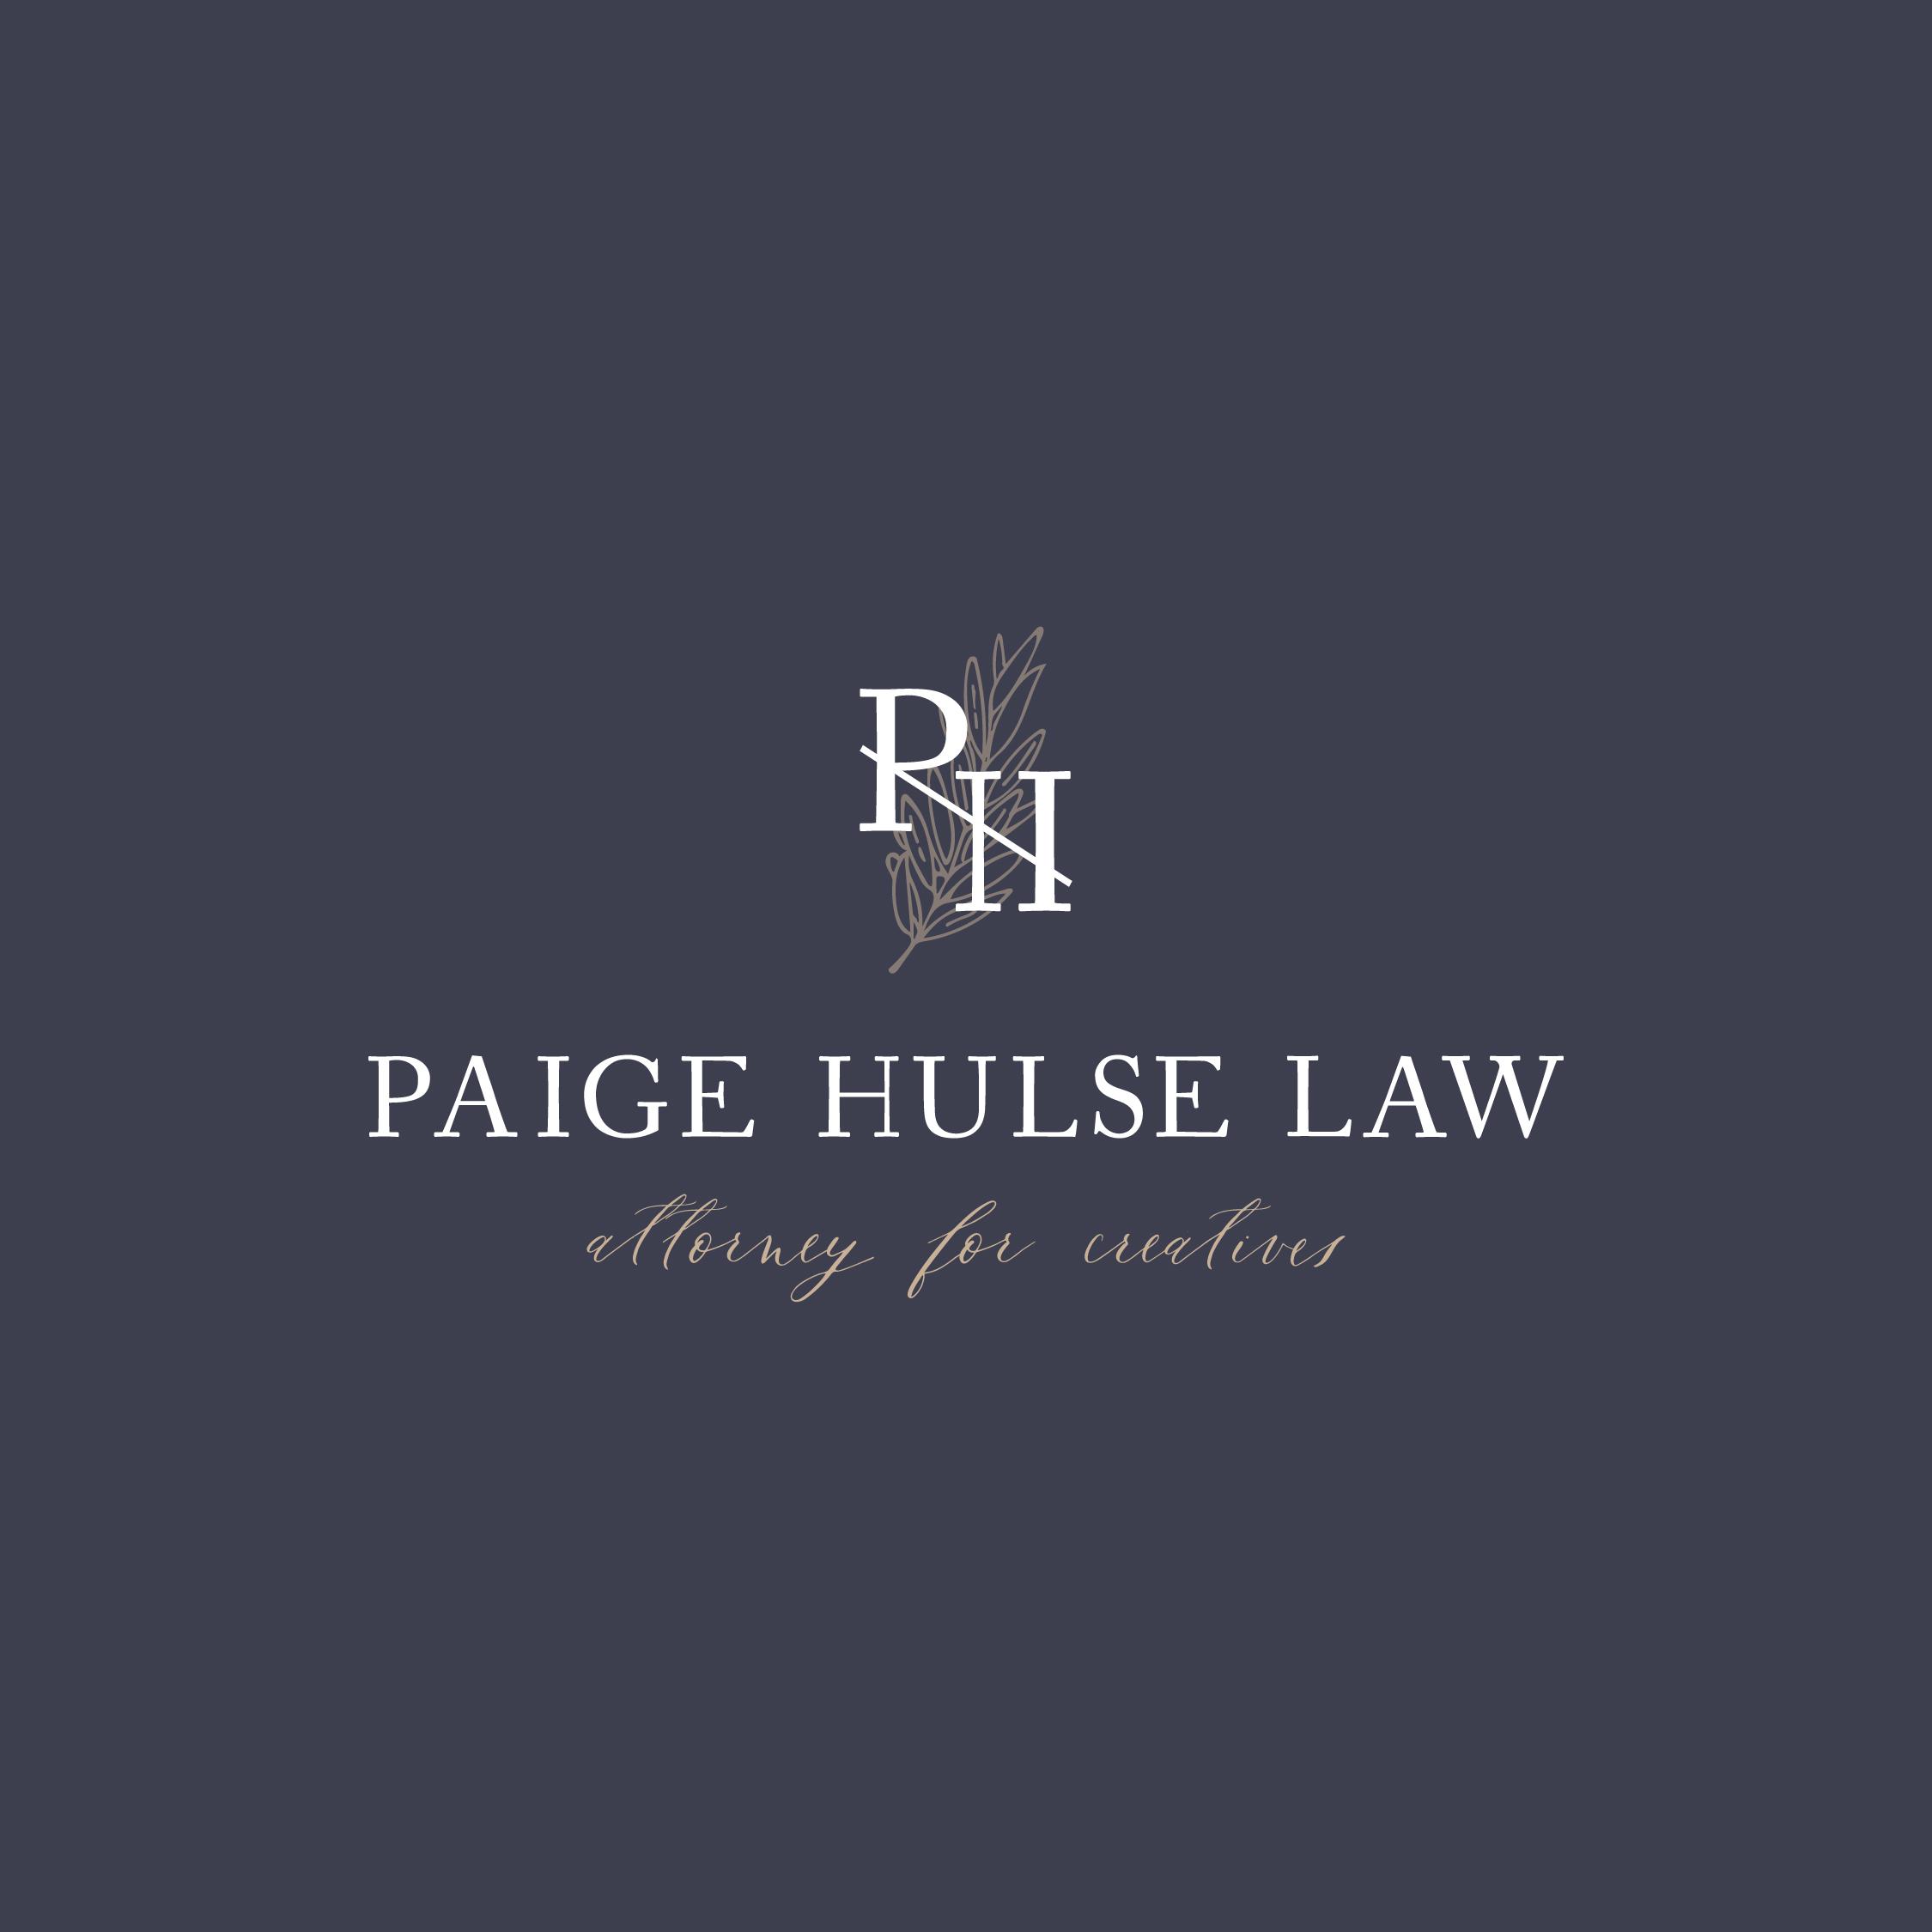 PaigeHulseLaw-LogoDesign-TulsaBrandDesigner.jpg